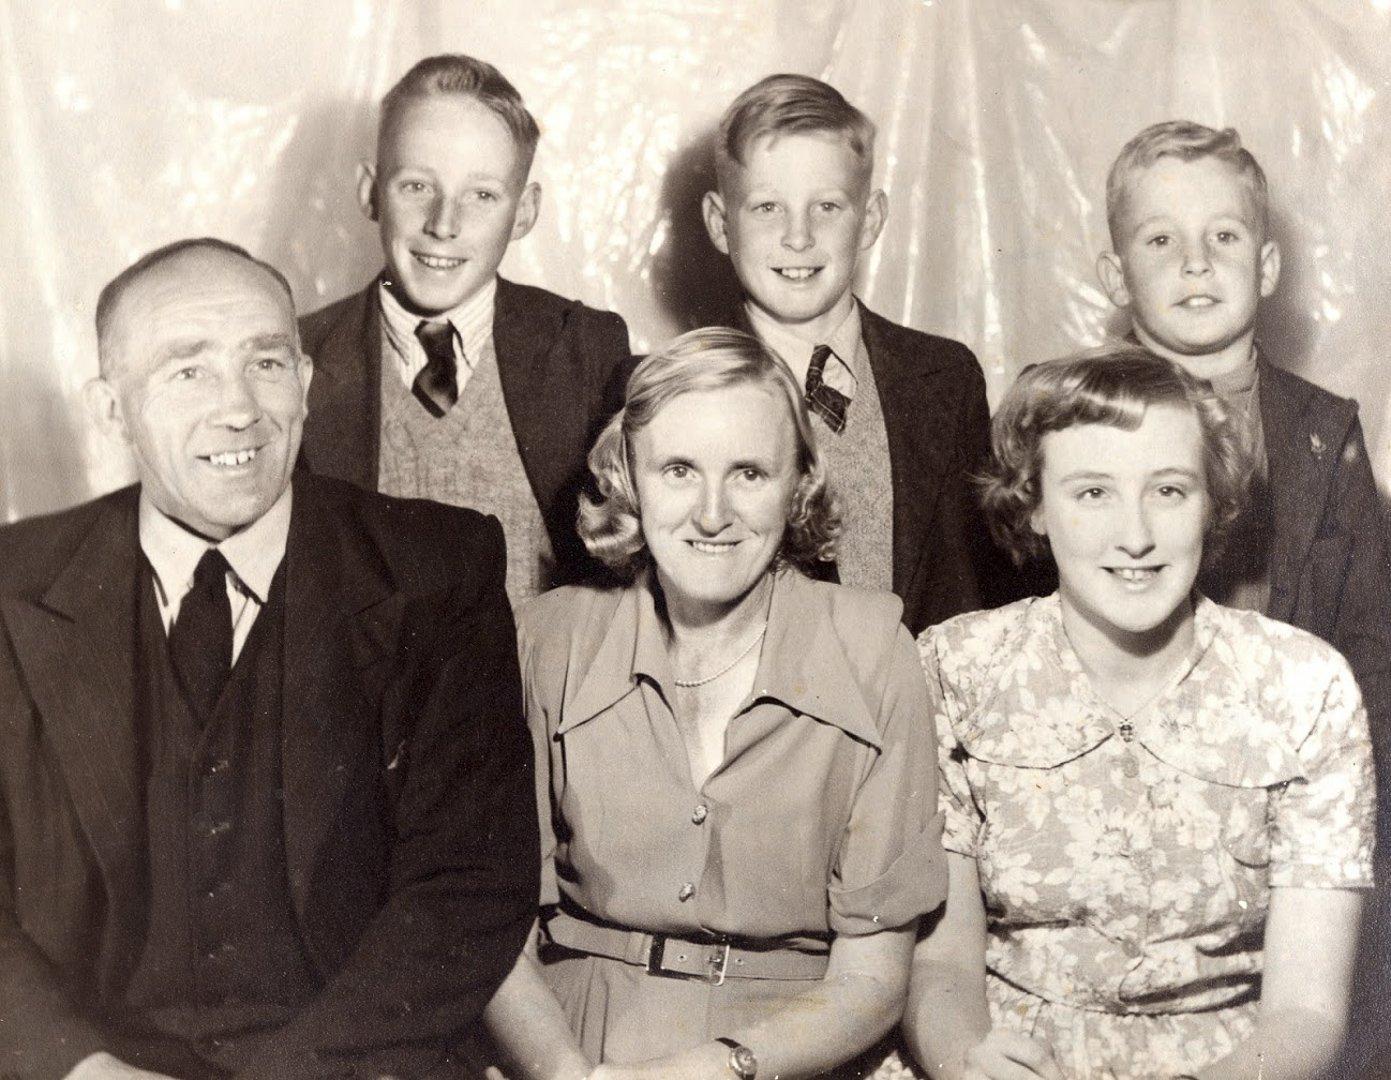 Front row: James Chester Draper, Beatrice Violet Draper (née Jullyan) and eldest child, Elaine.  Back row: Robert, Alan and Bruce Draper c 1949